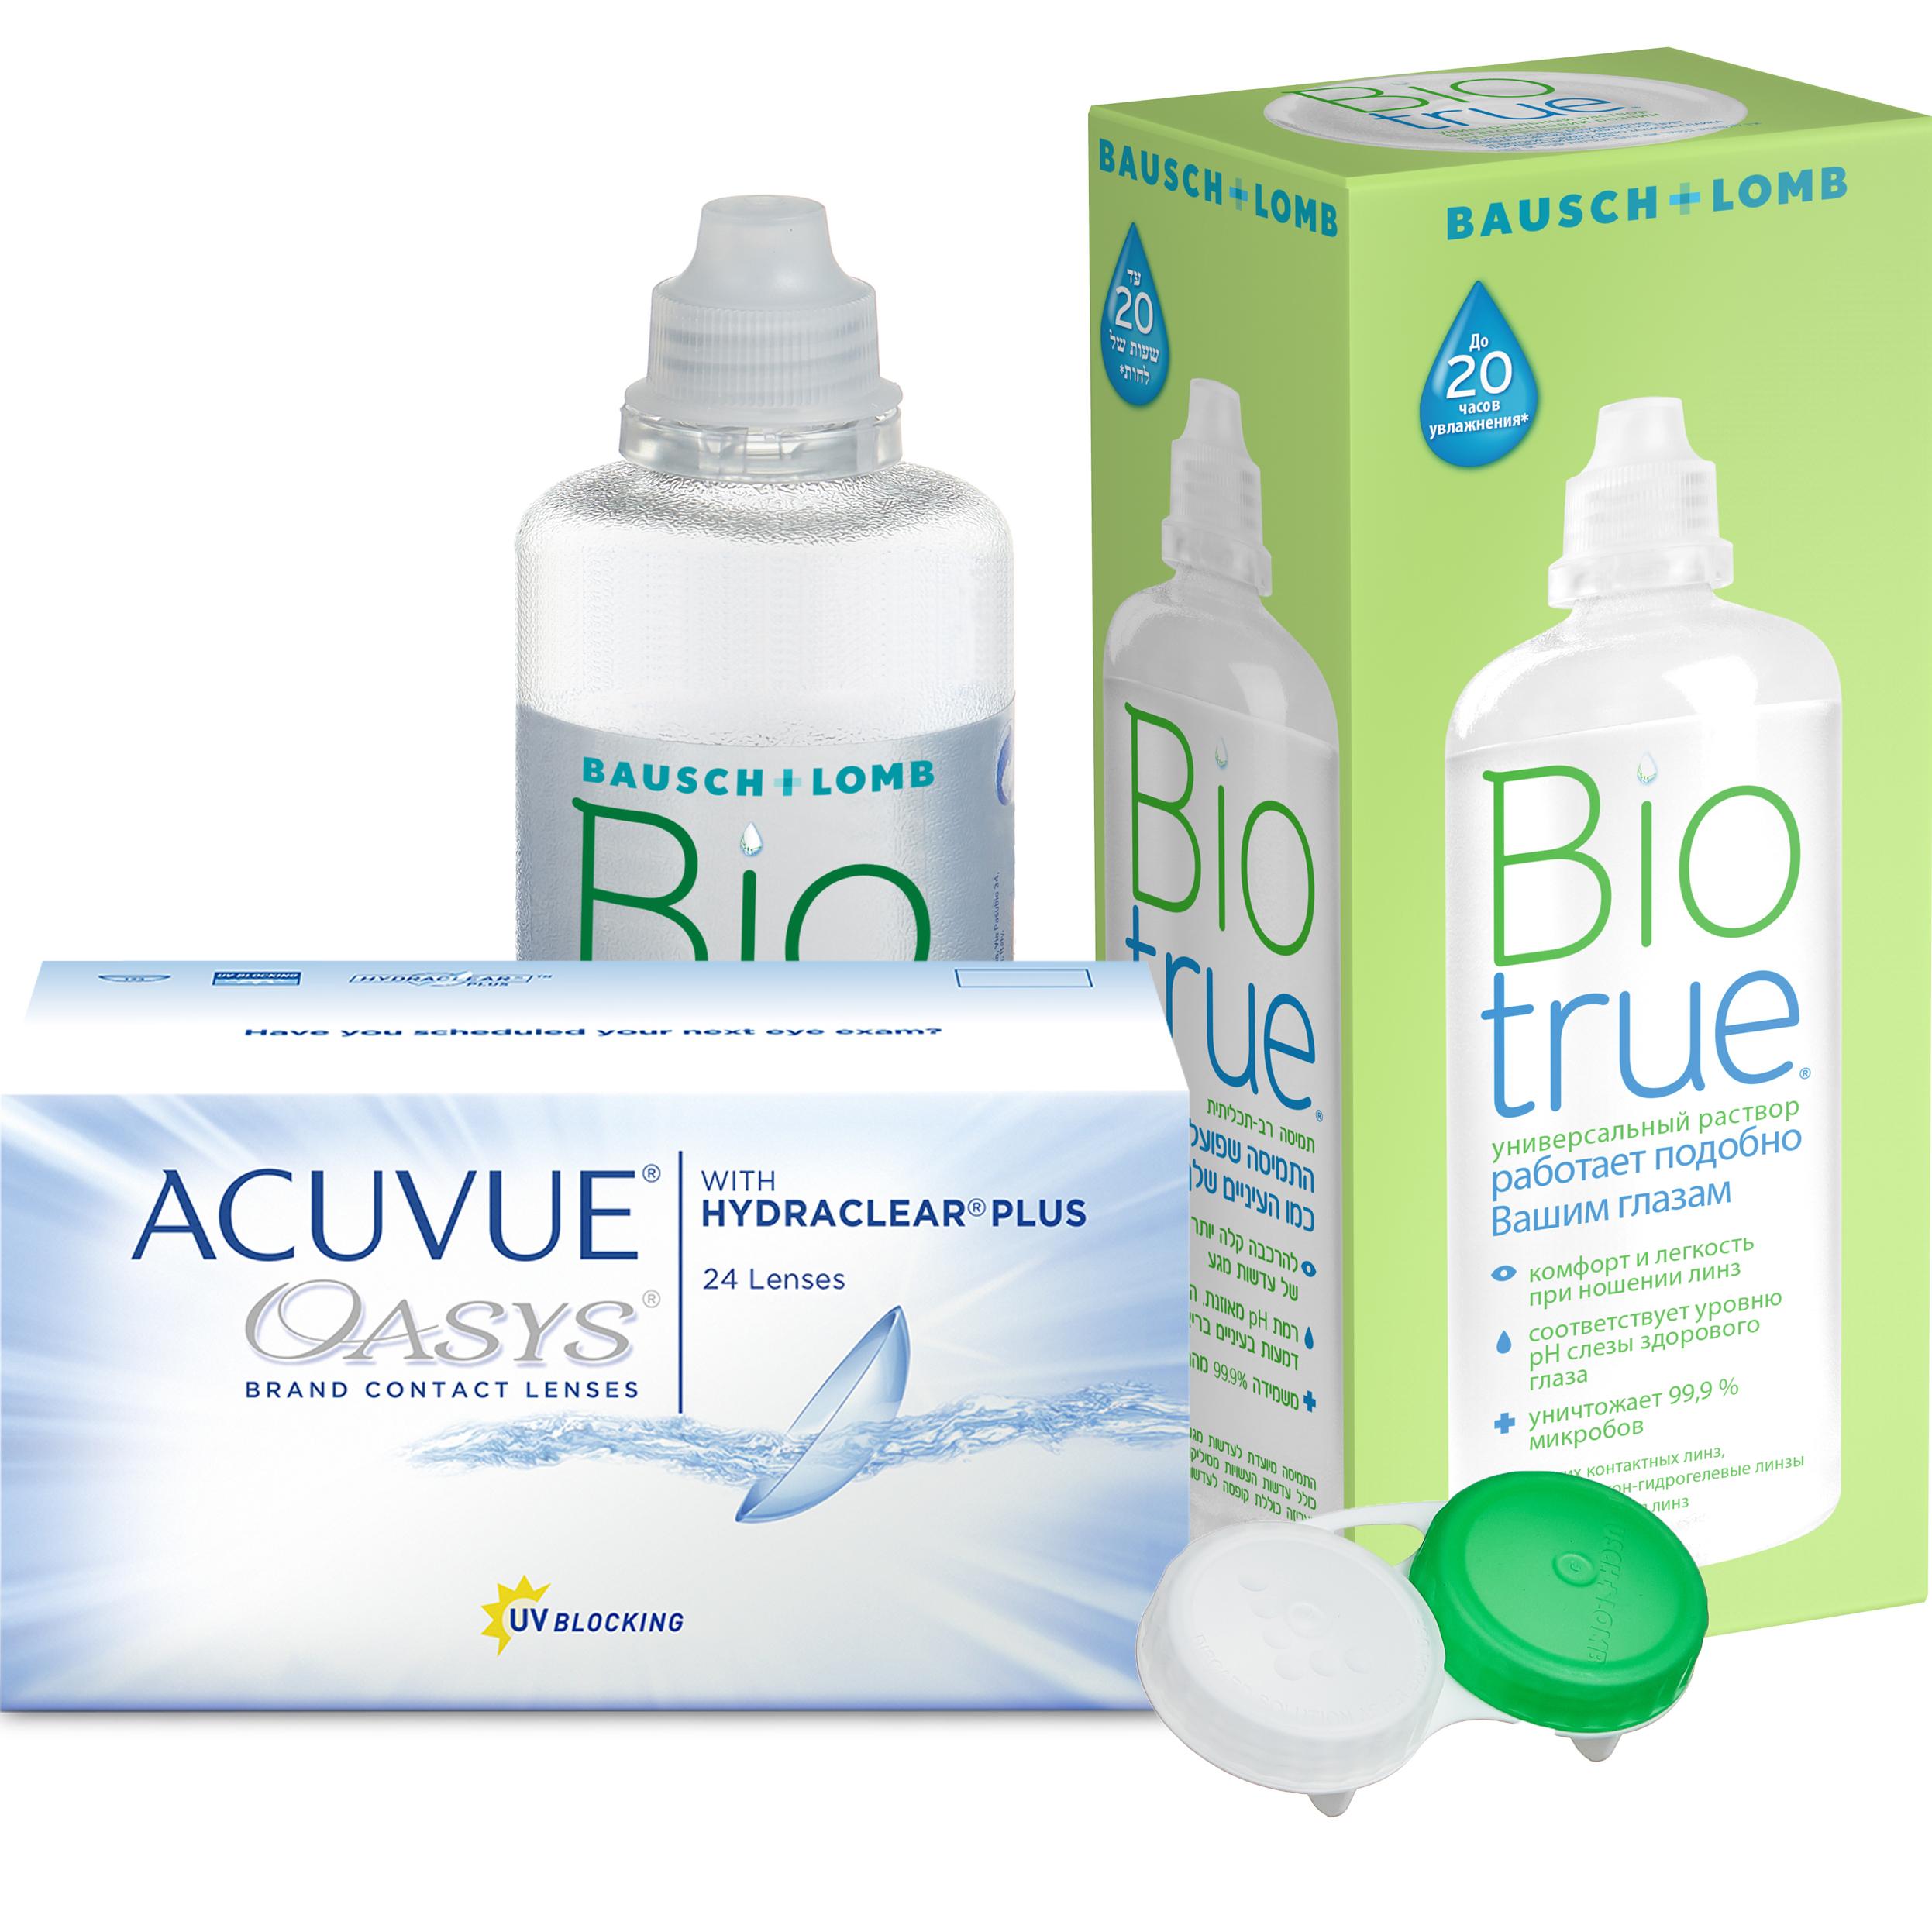 Oasys with Hydraclear Plus 24 линзы + Biotrue, Контактные линзы Acuvue Oasys with Hydraclear Plus 24 линзы R 8.4 -6, 00 + Biotrue 300 мл  - купить со скидкой